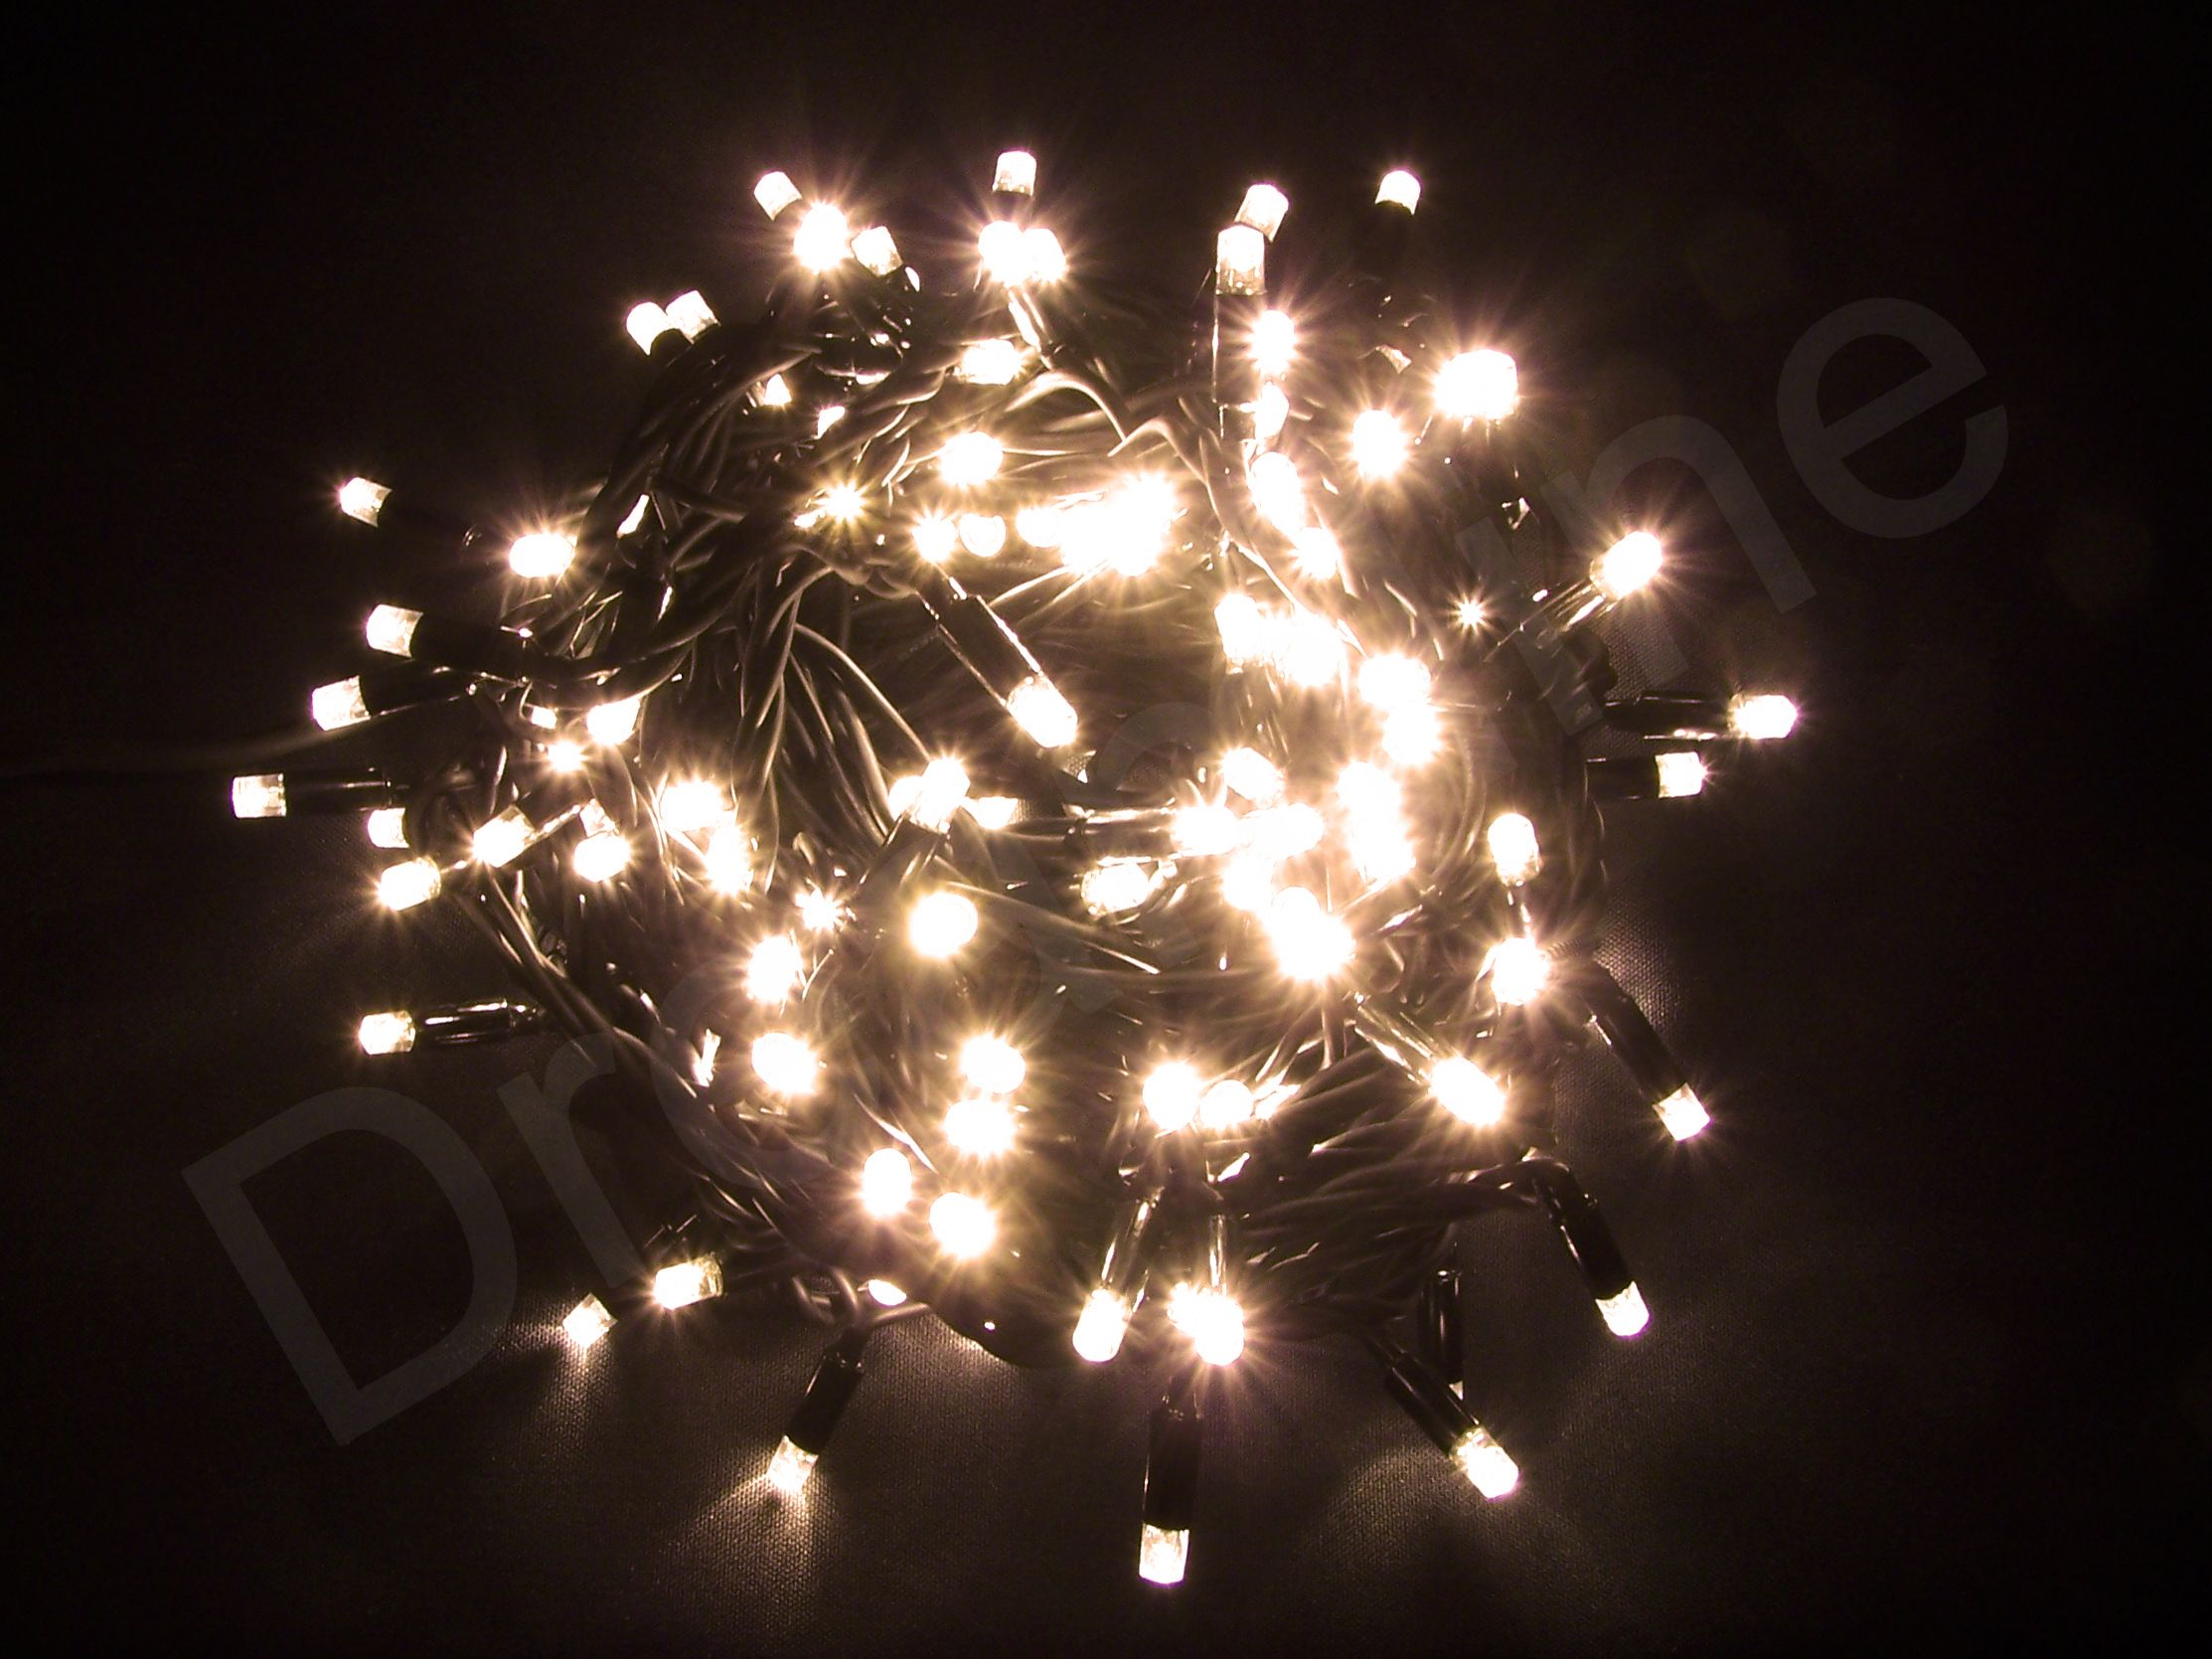 Led Weihnachtsbeleuchtung Ohne Kabel.Led Lichterkette Warm Weiß 20m 200 Leds